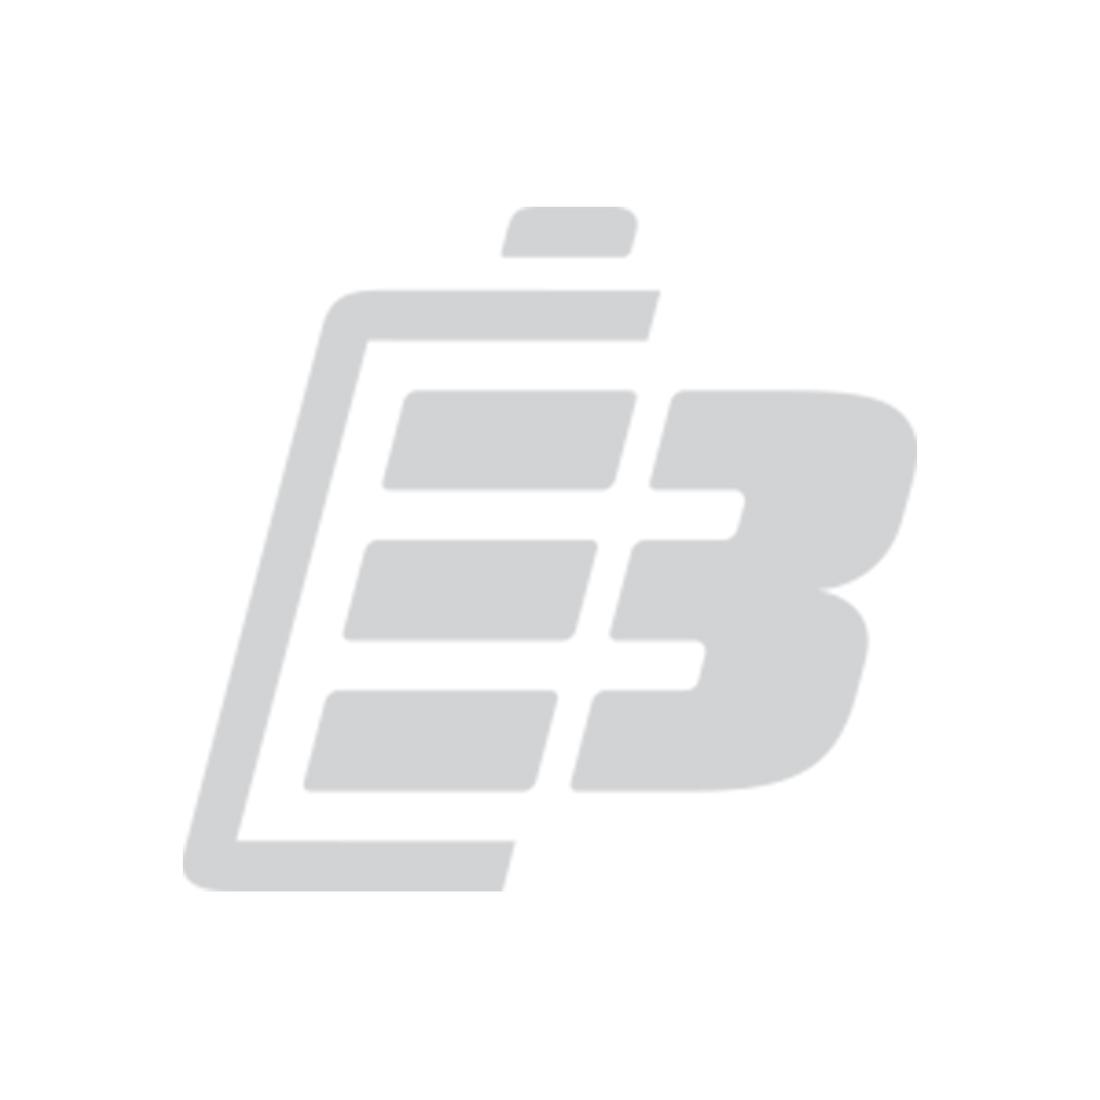 Remote control battery Sonos Controller CR100_1